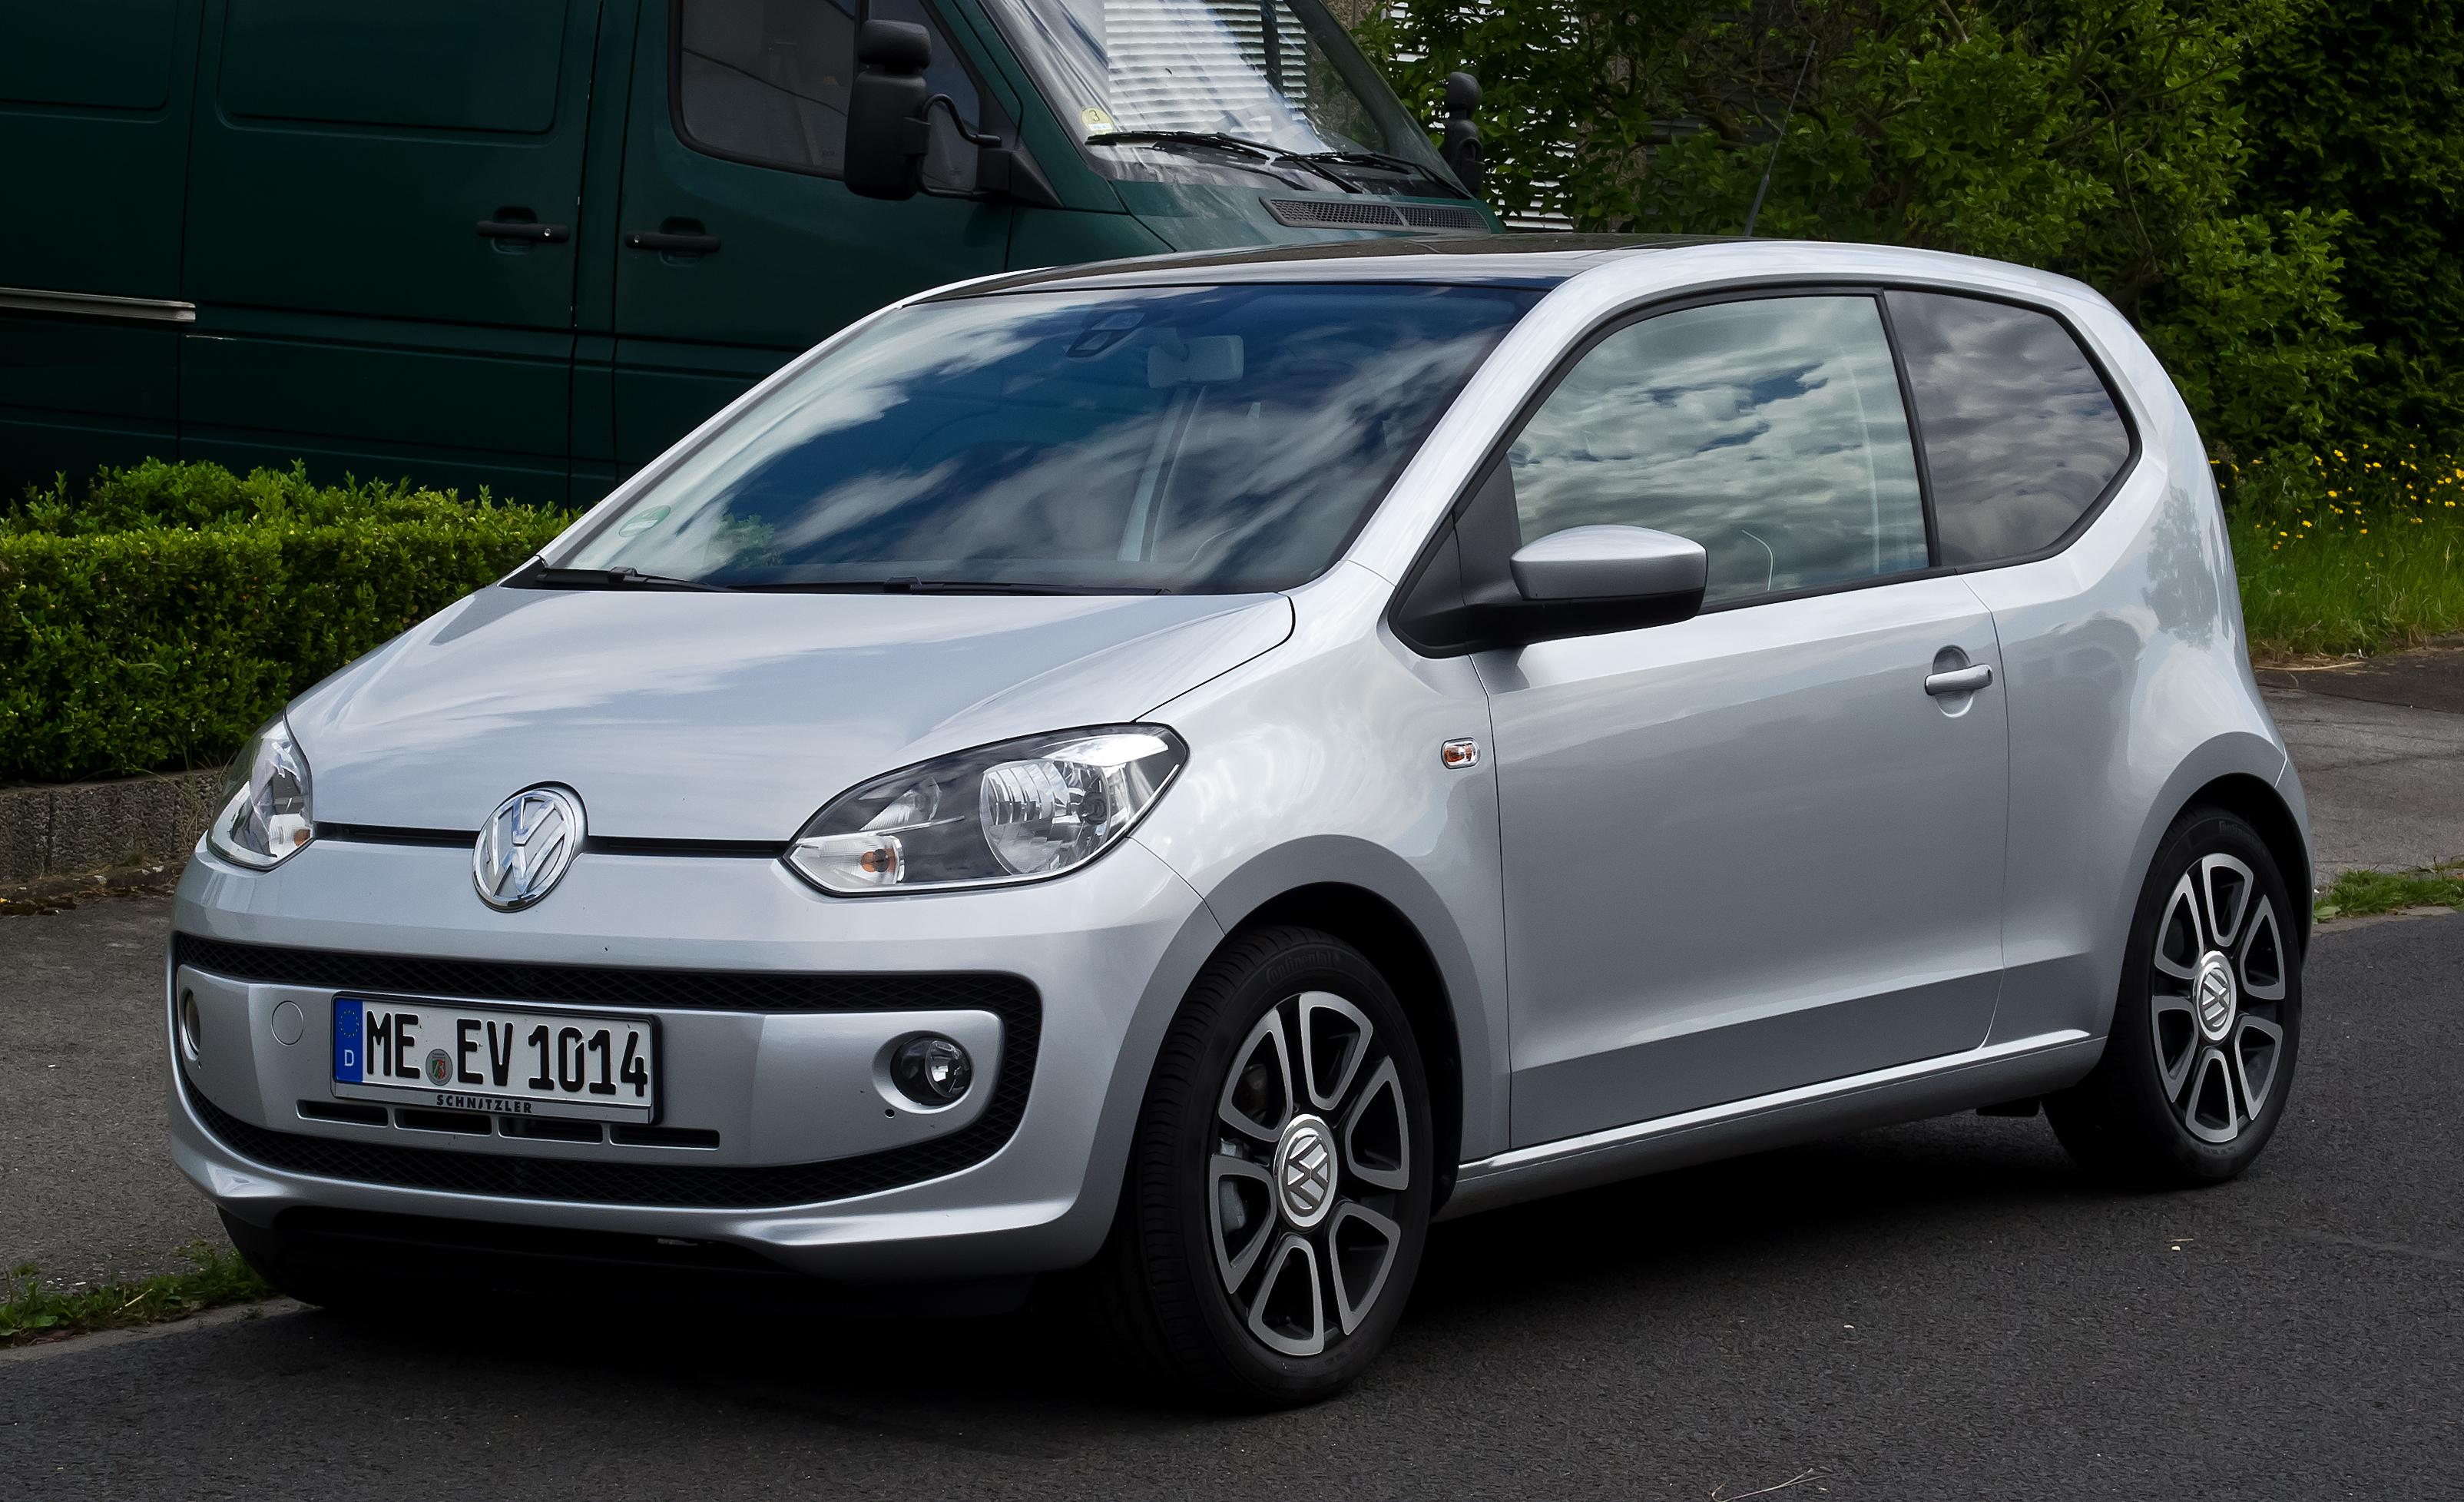 Fin Volkswagen up! - Wikipedia, den frie encyklopædi EL-31